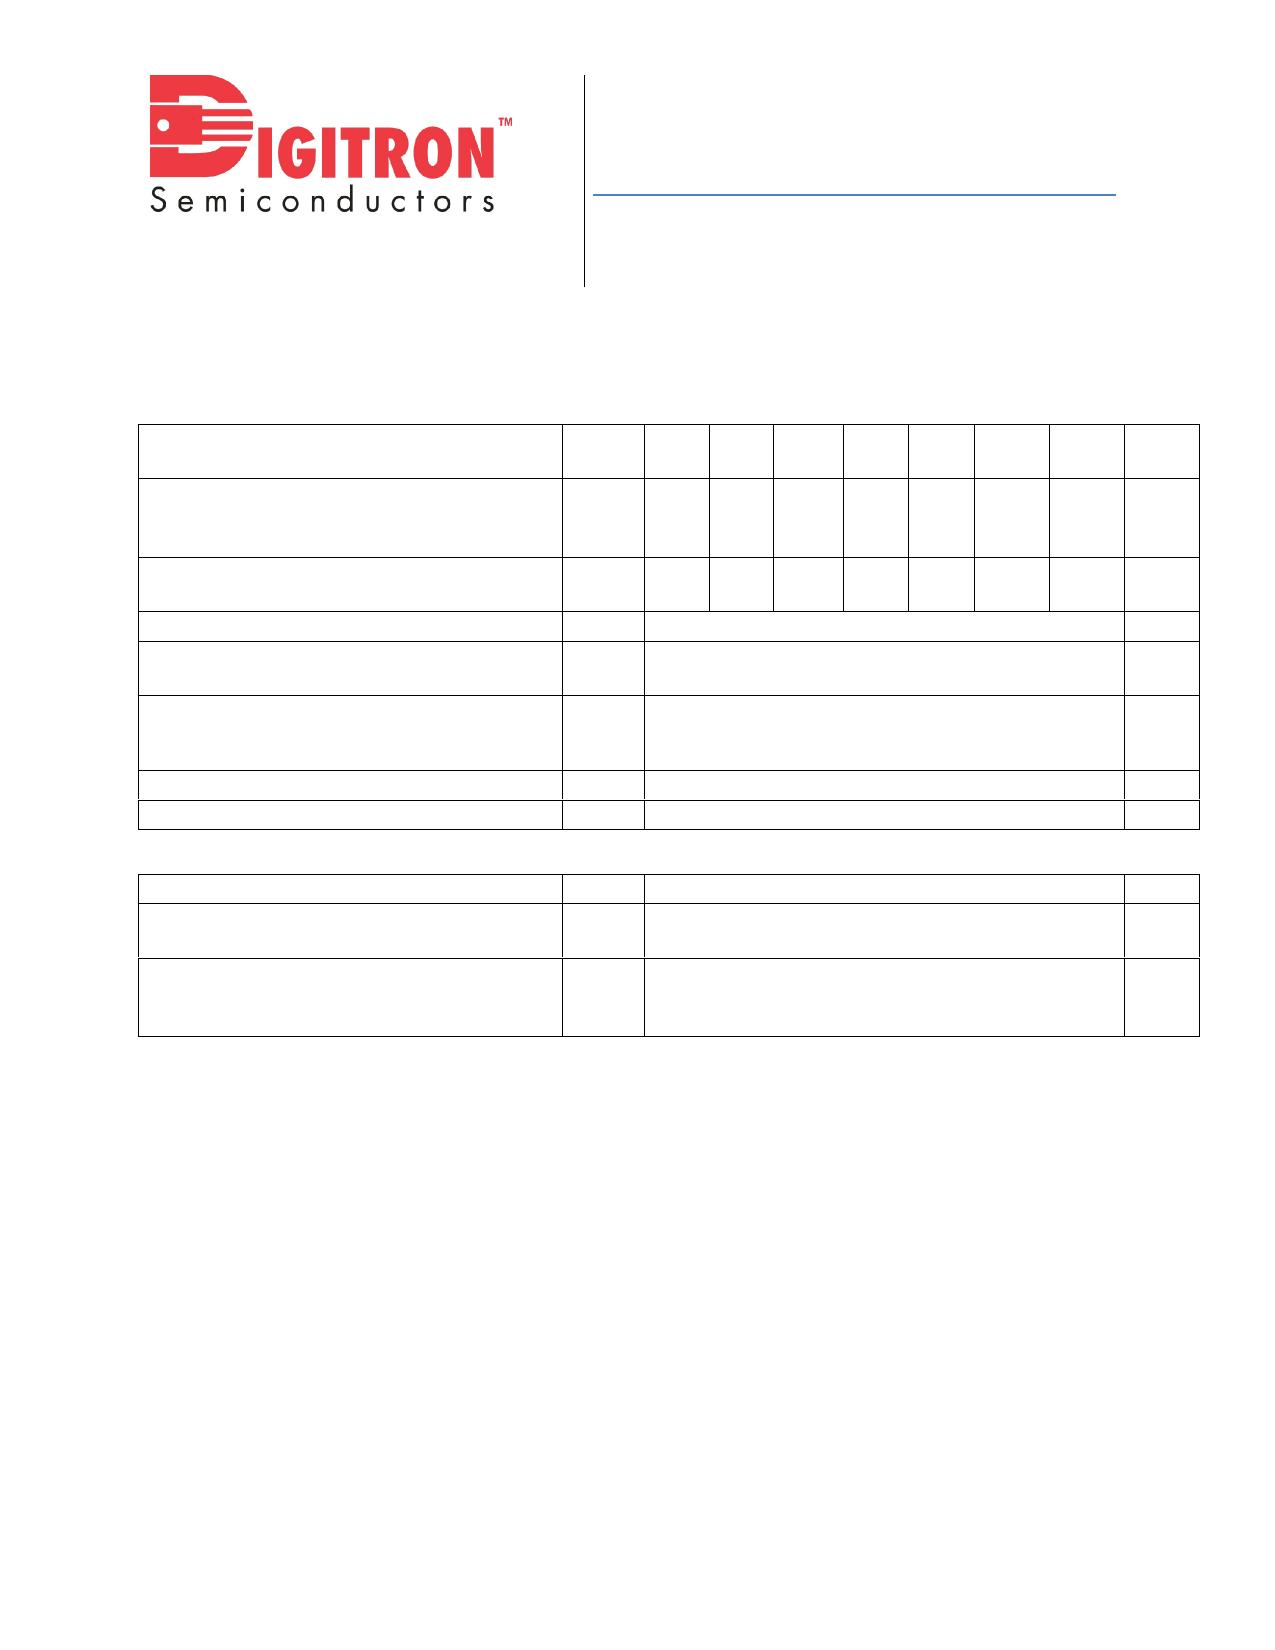 MR2002 데이터시트 및 MR2002 PDF